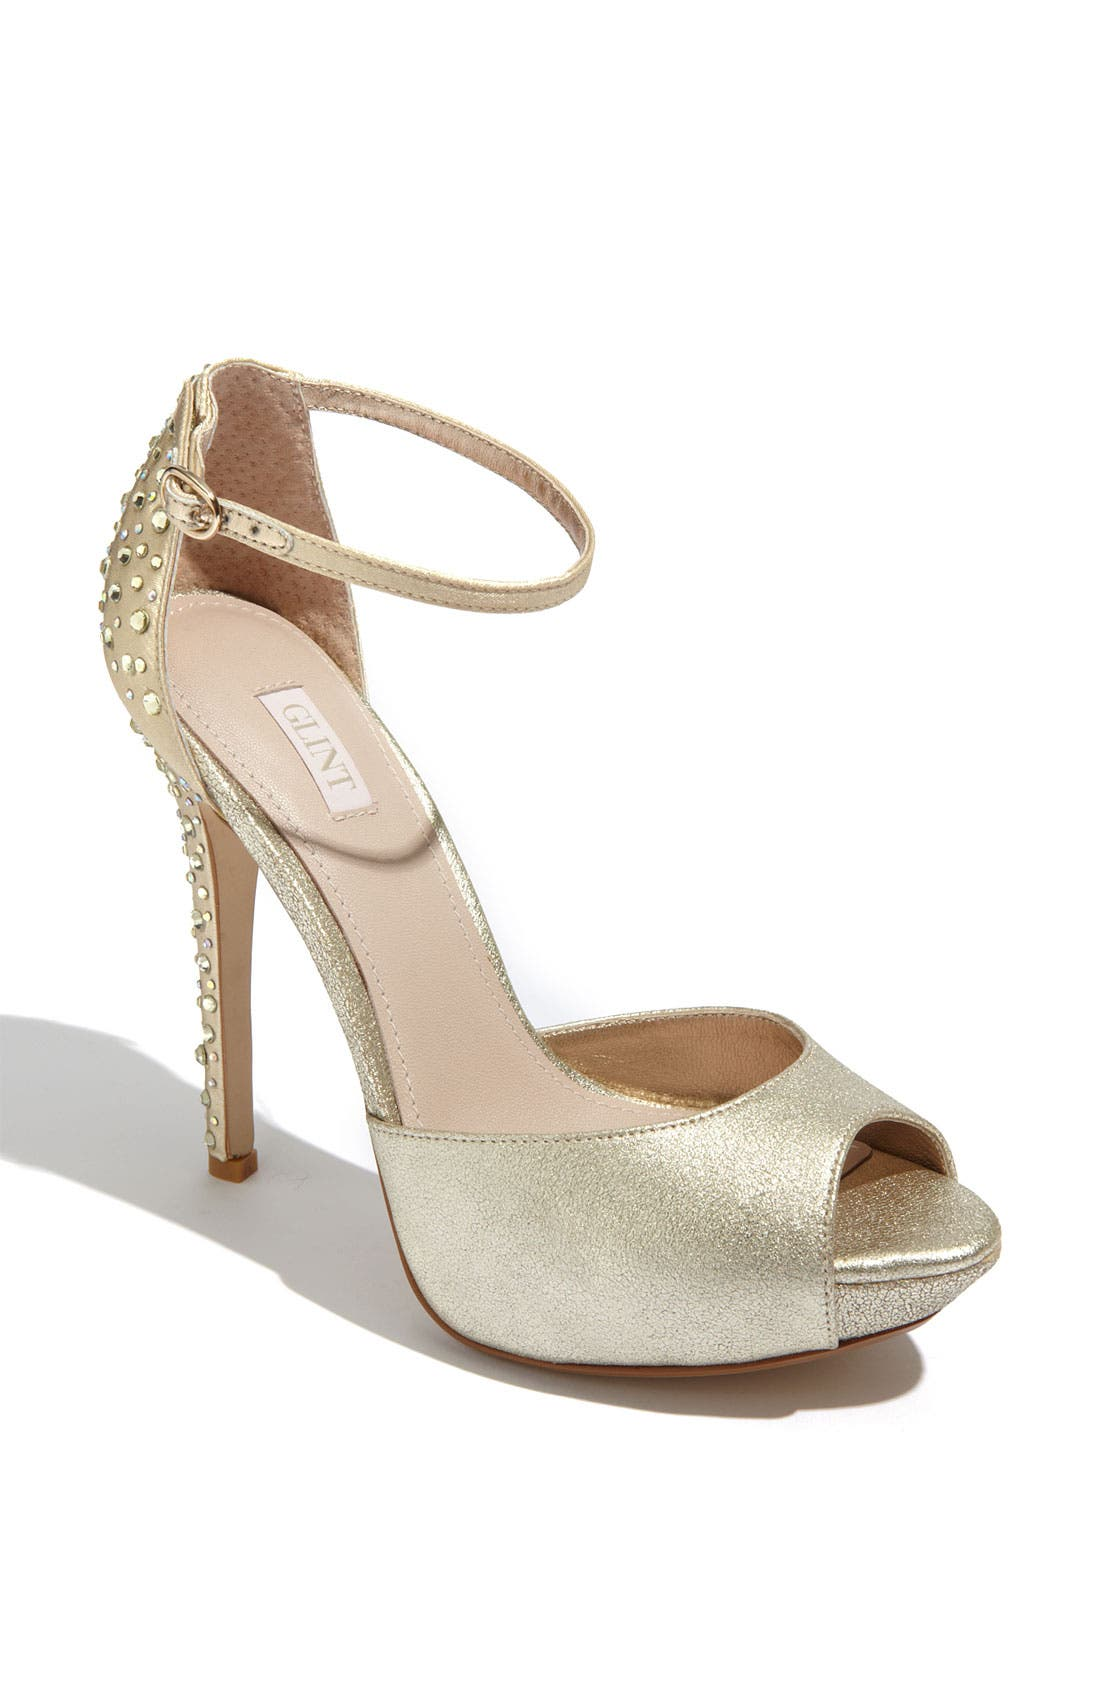 Main Image - Glint 'Viola' Jeweled Sandal